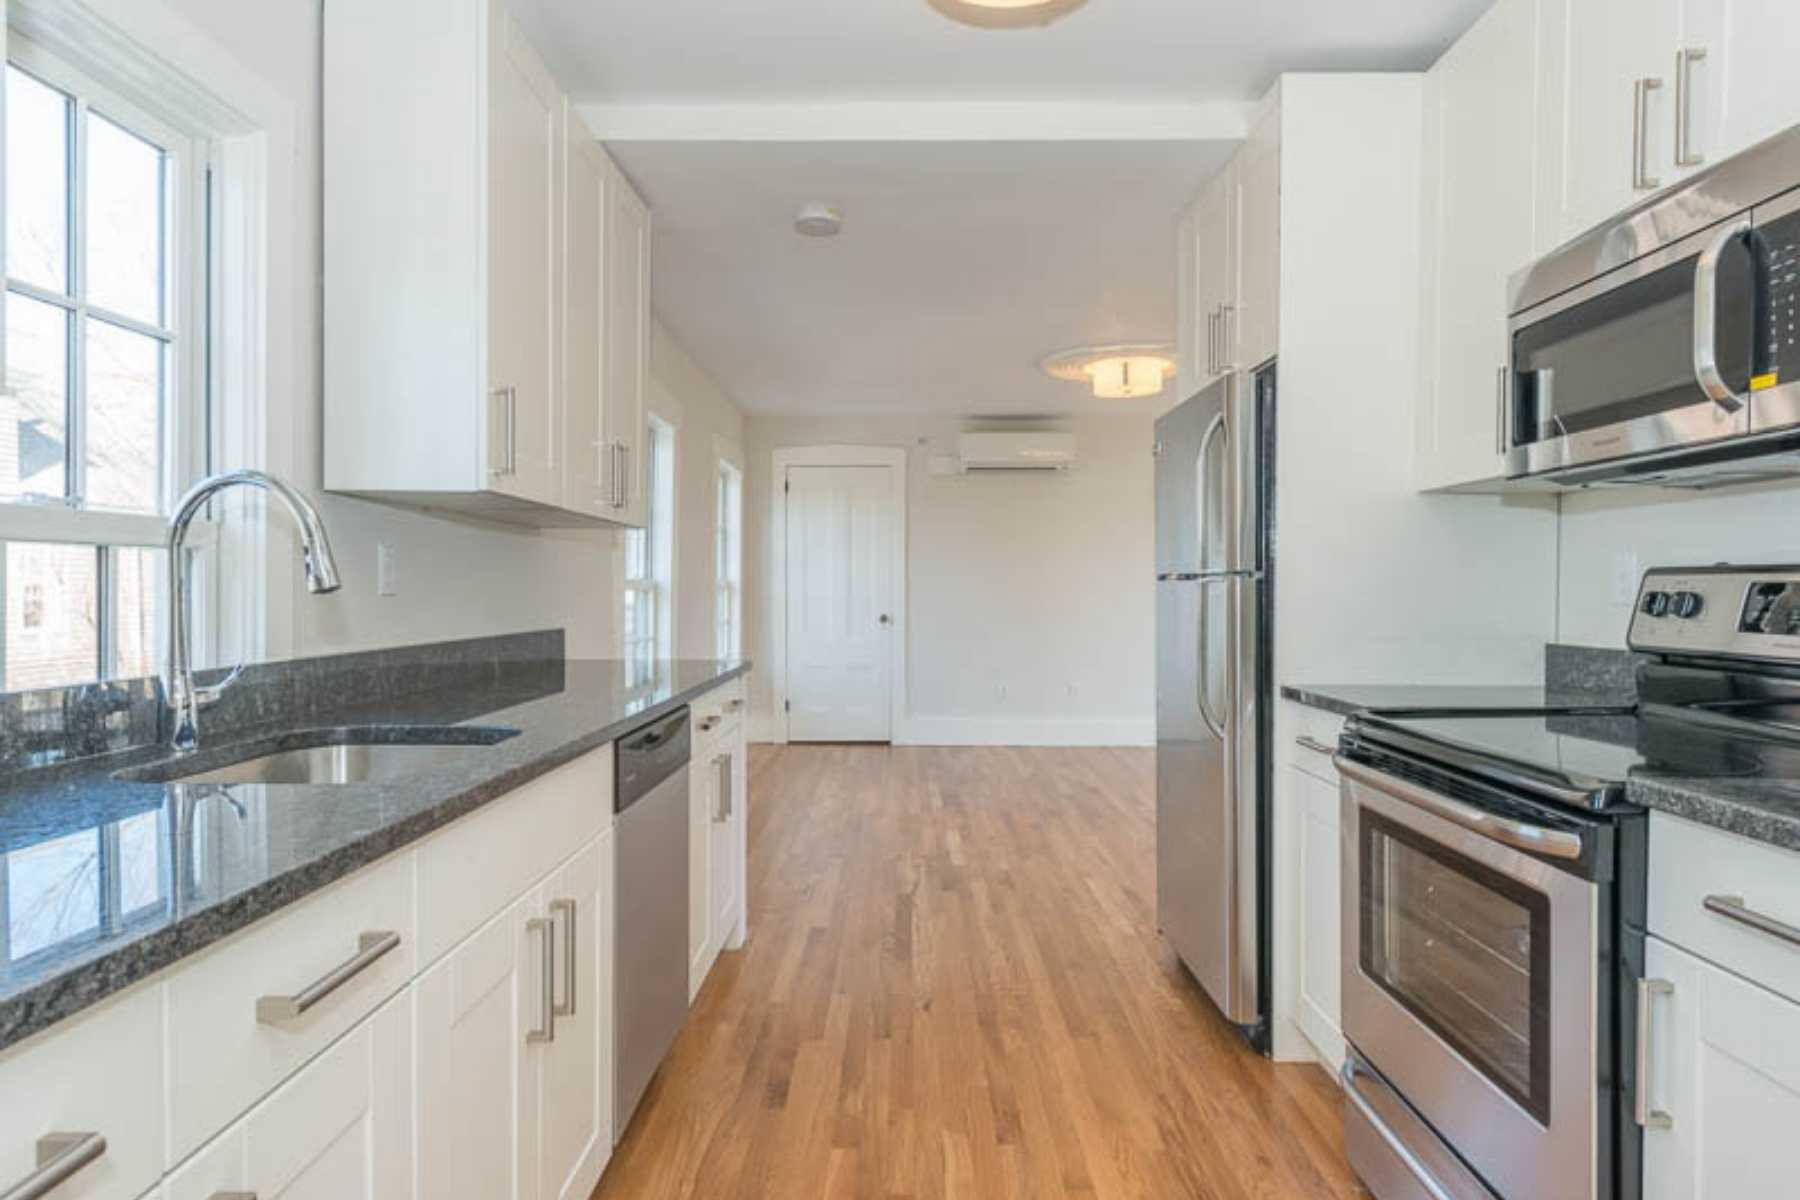 11-CapstoneCommunities-property-13 WinterStreet-Arlington.jpg